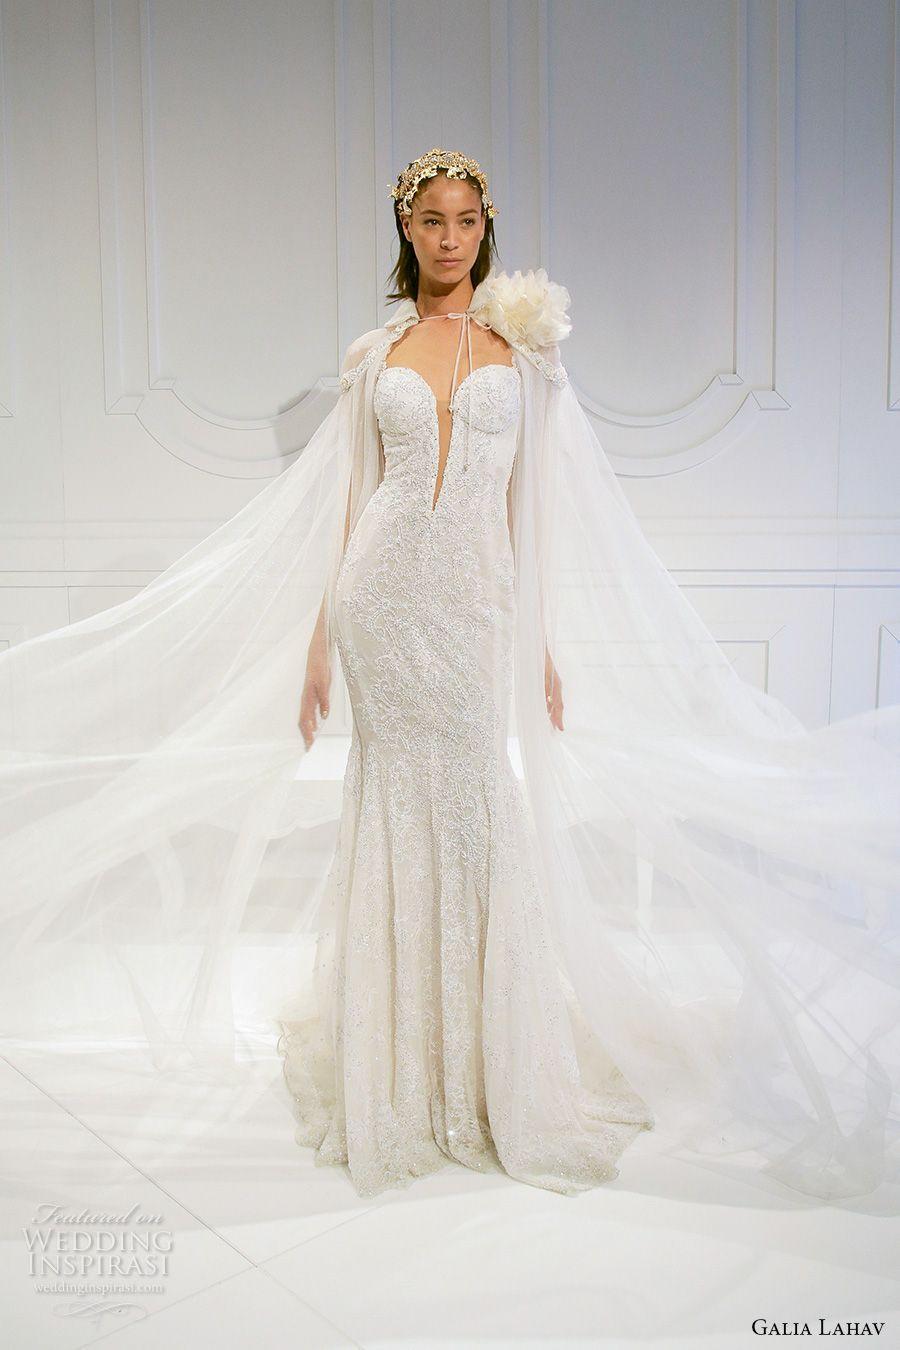 Galia lahav spring wedding dresses u ucle secret royalud couture